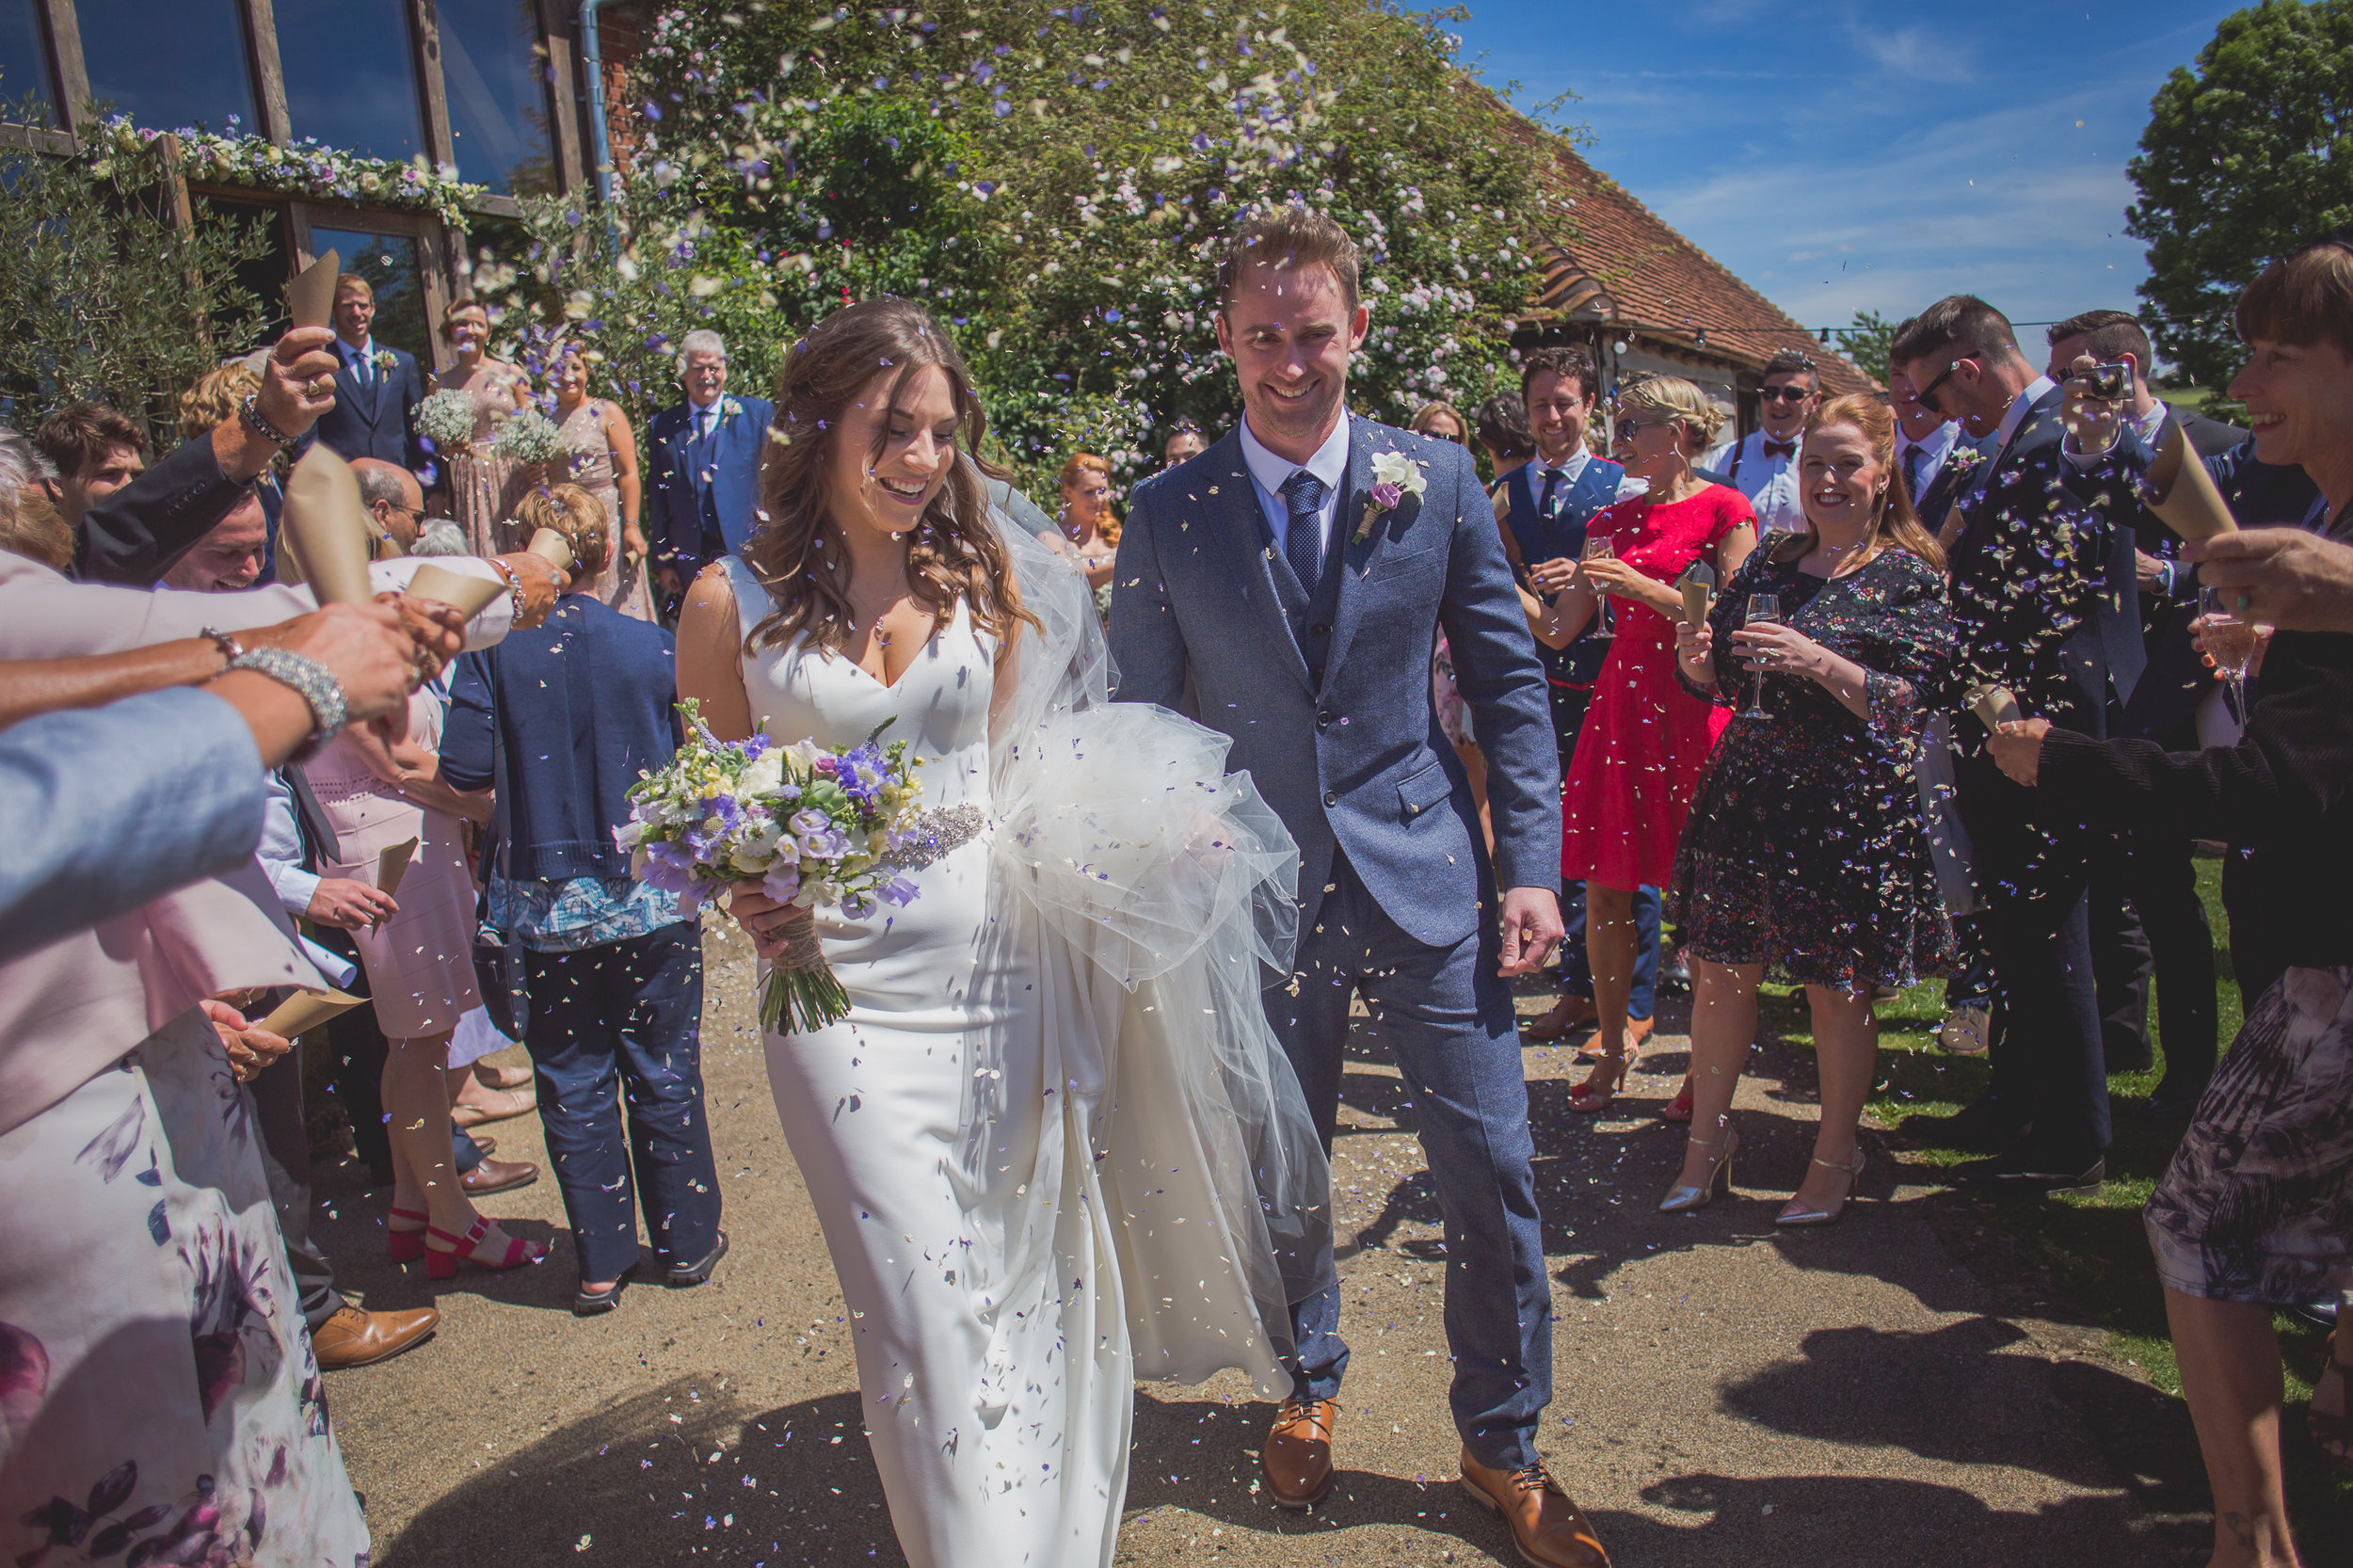 Grittenham Barn female wedding photographers west sussex petworth social-77.jpg